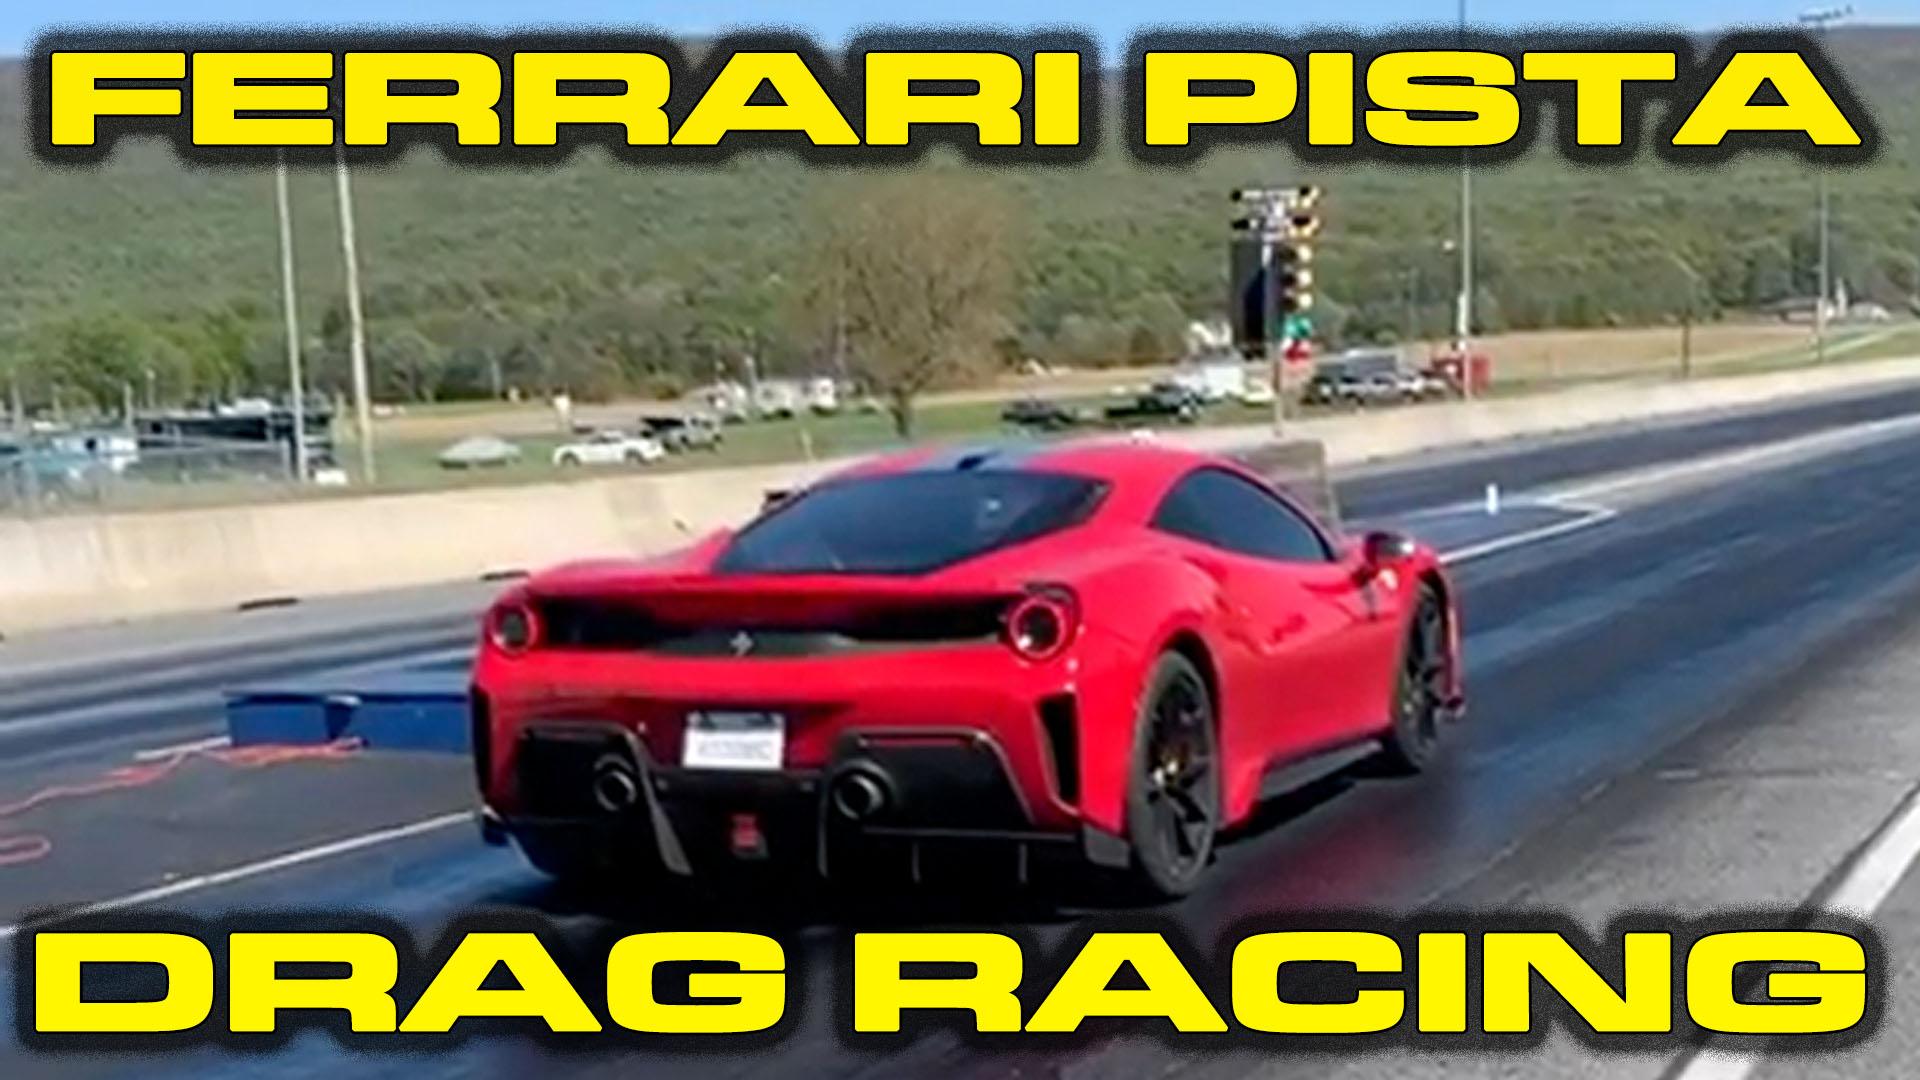 Ferrari Pista 1/4 Mile with Brooks Weisblat